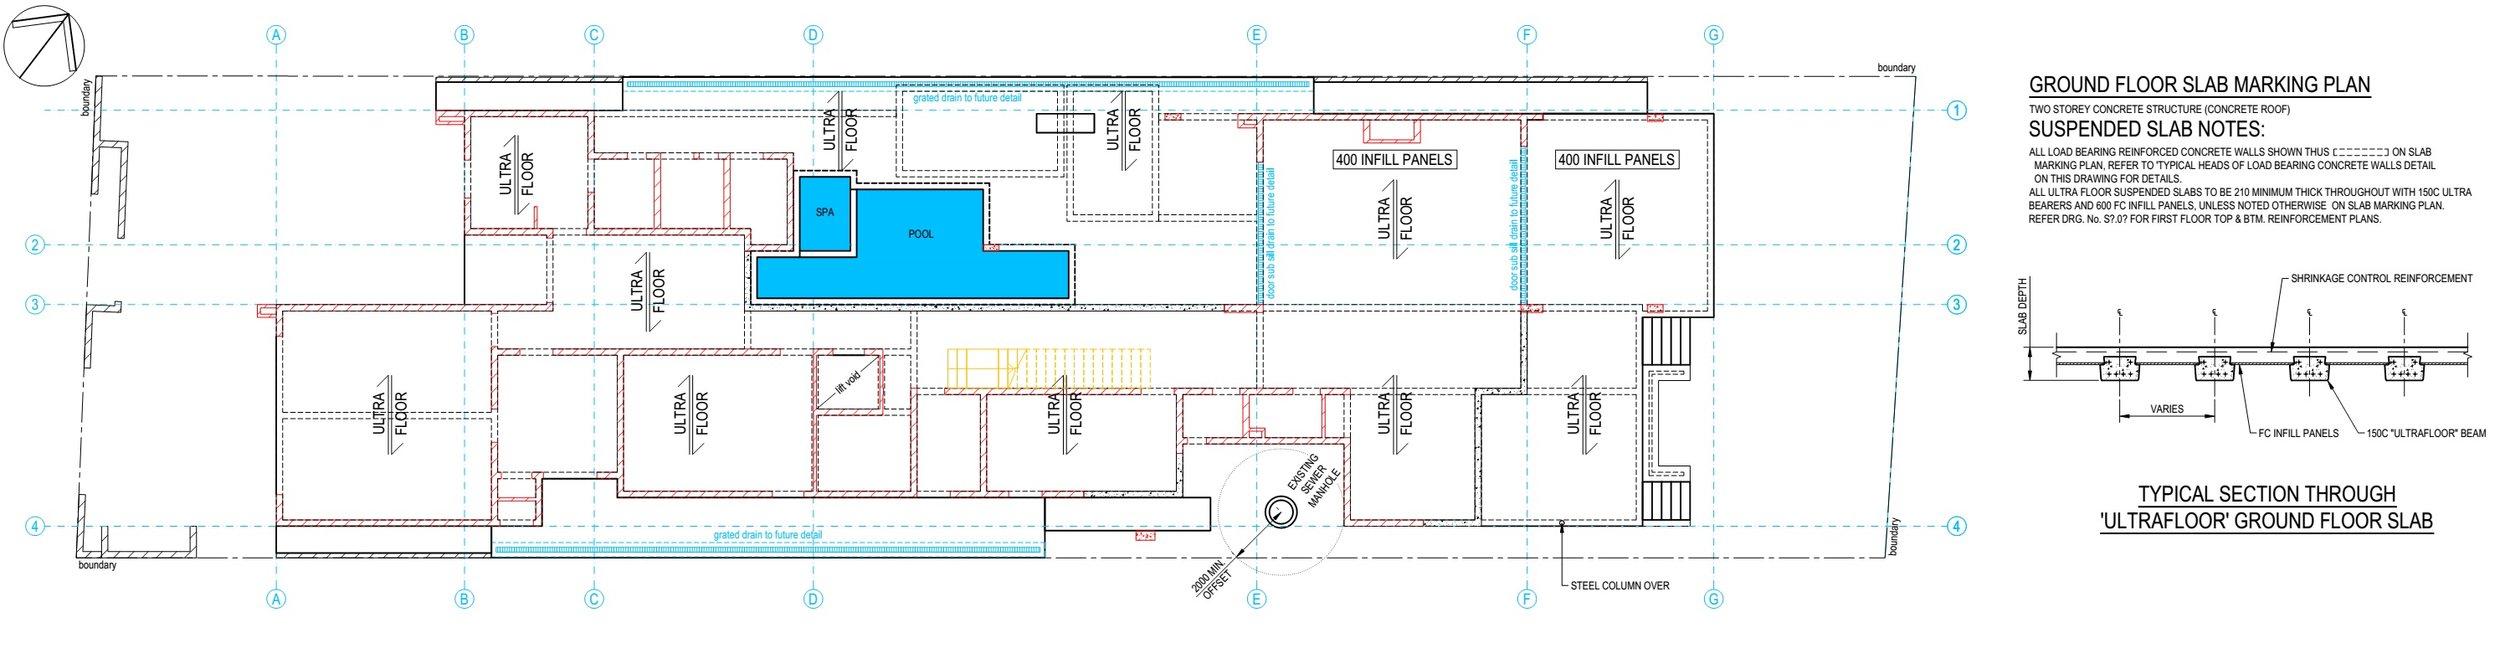 AUS02-17097 - GF slab plan.jpg